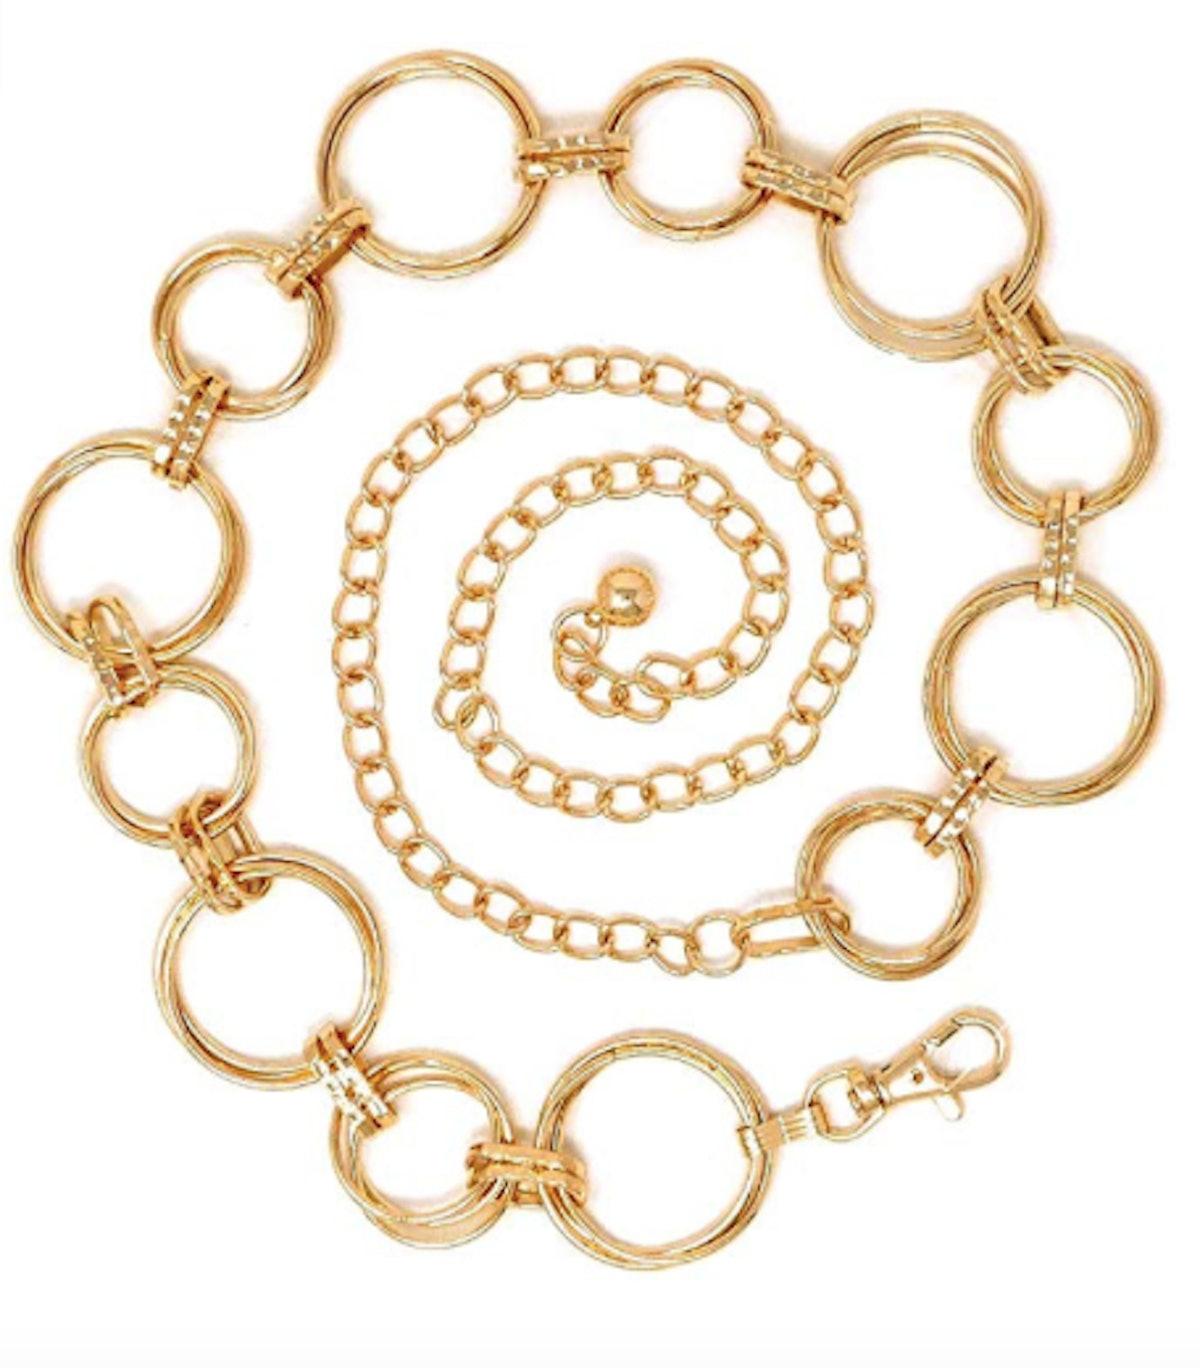 Polished O- Ring Metal Link Chain Belt